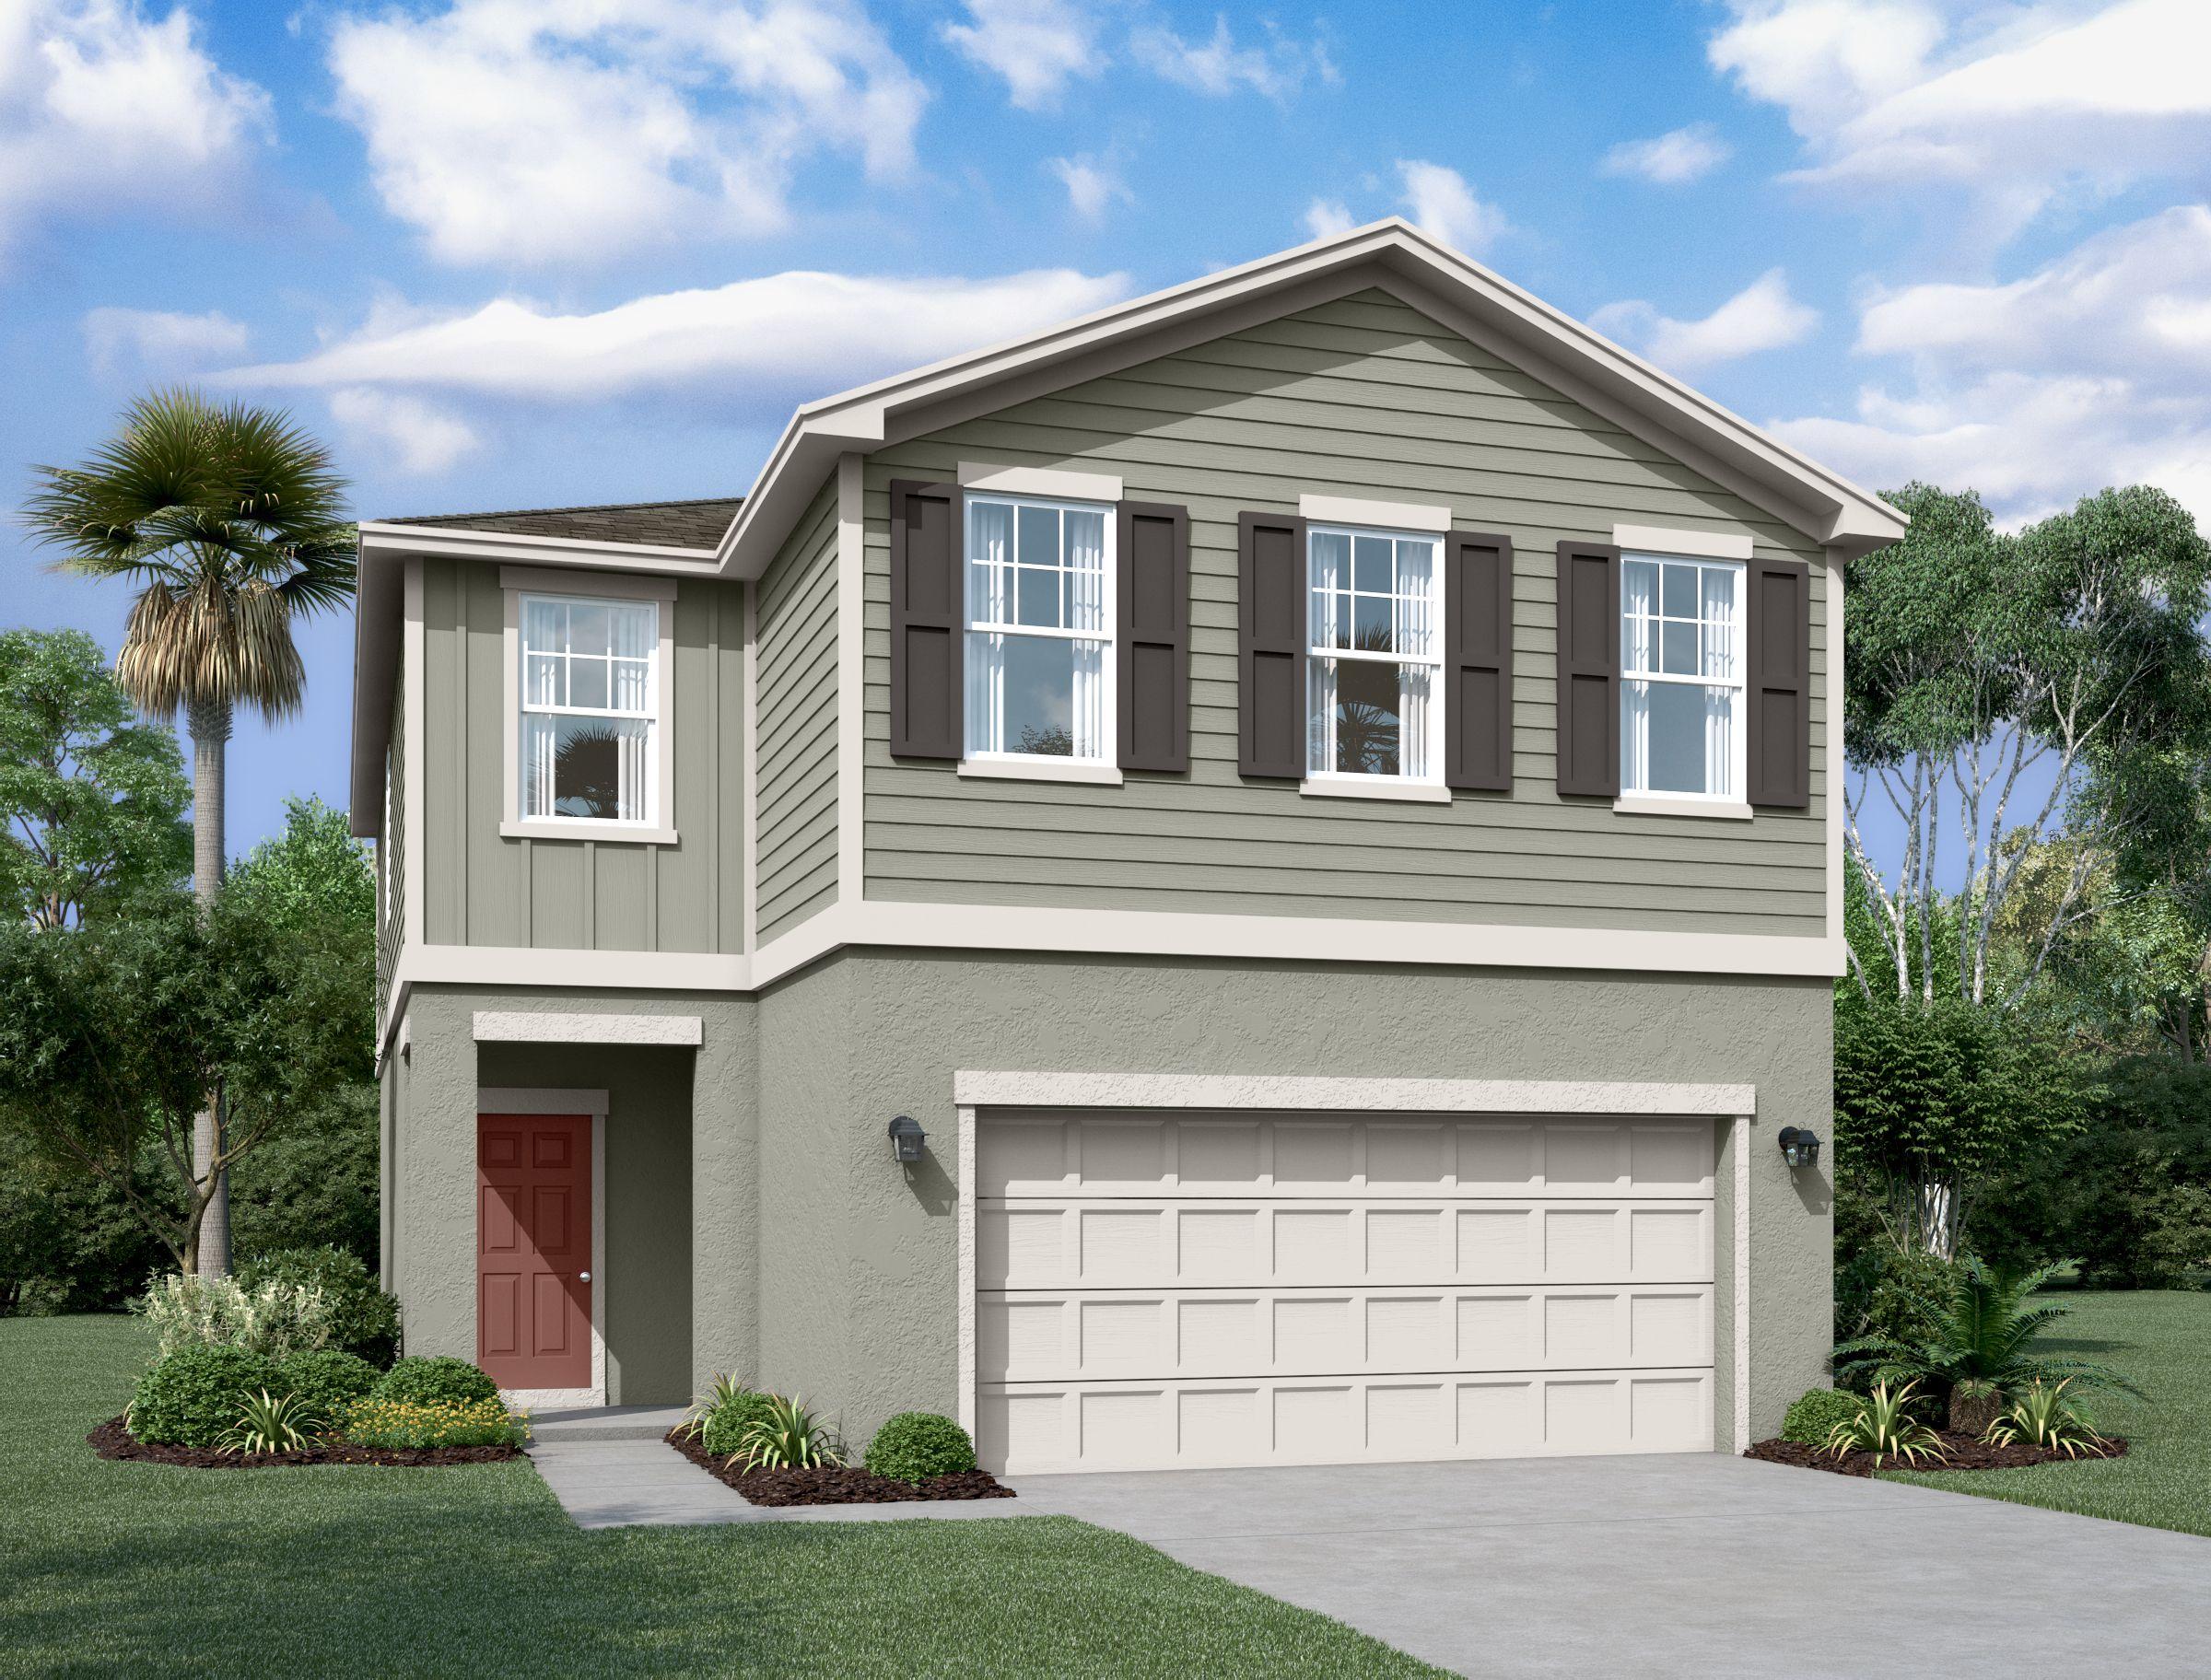 'Lincoln Oaks' by Starlight Homes-Central Florida in Daytona Beach